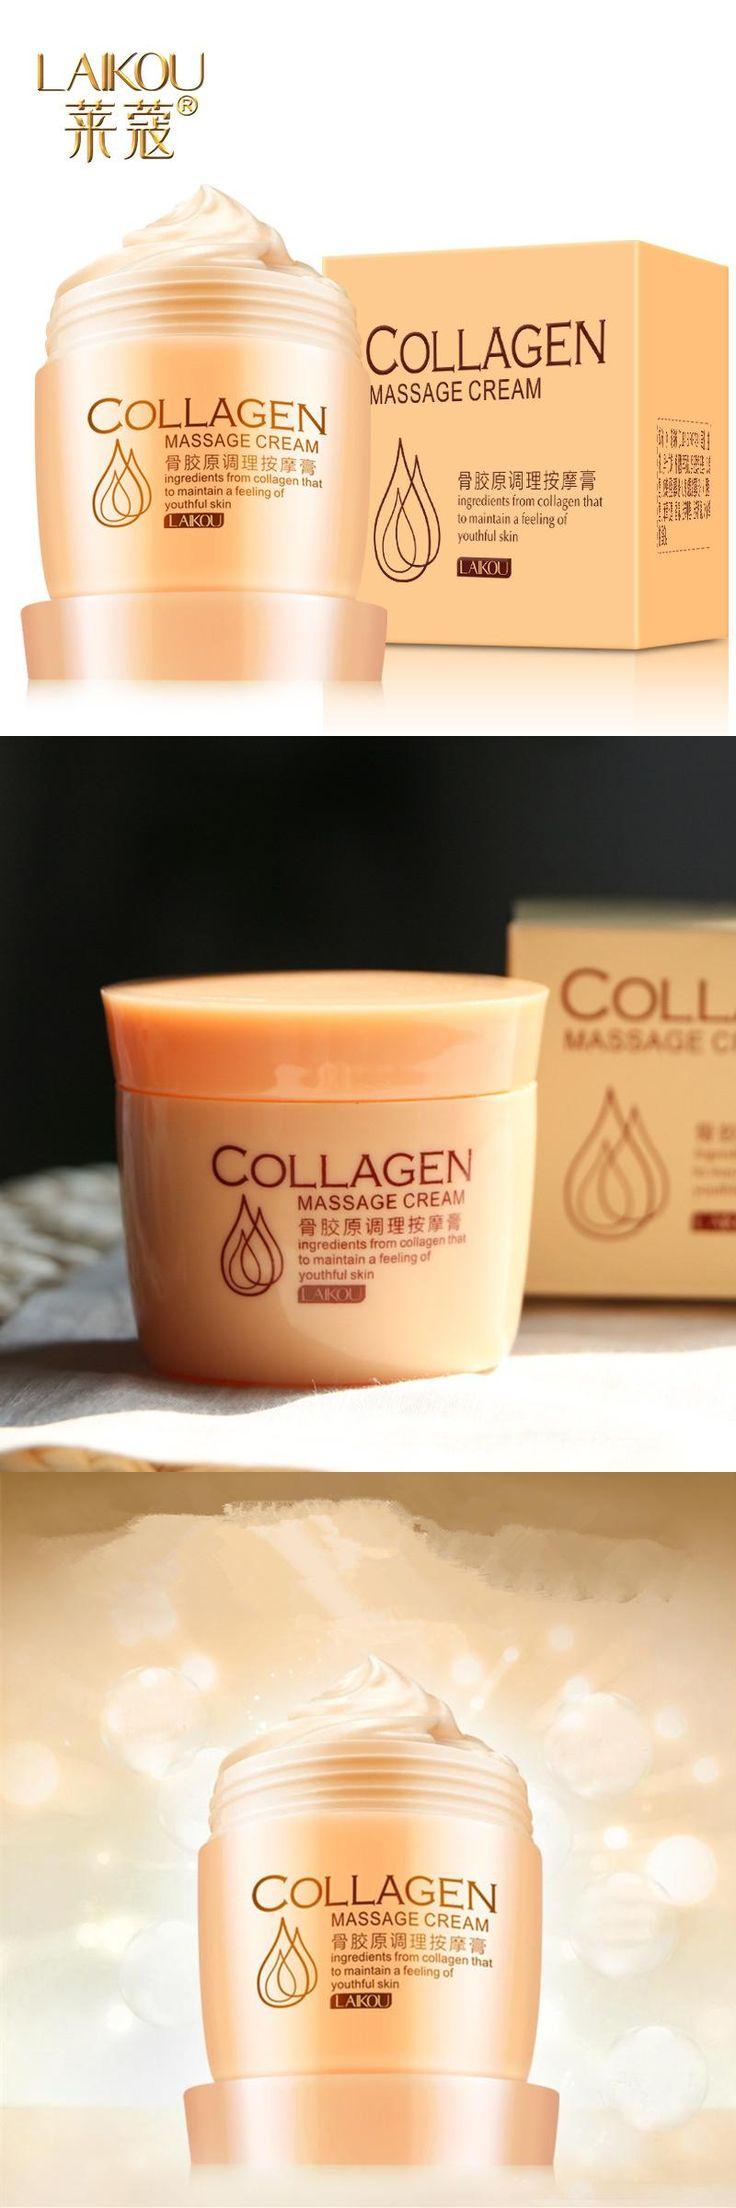 [Visit to Buy] LAIKOU Collagen Massage Whitening Cream Exfoliate Deep Pore Cleansing Oil Balance Facial Cream Massage Cream Skin Care #Advertisement